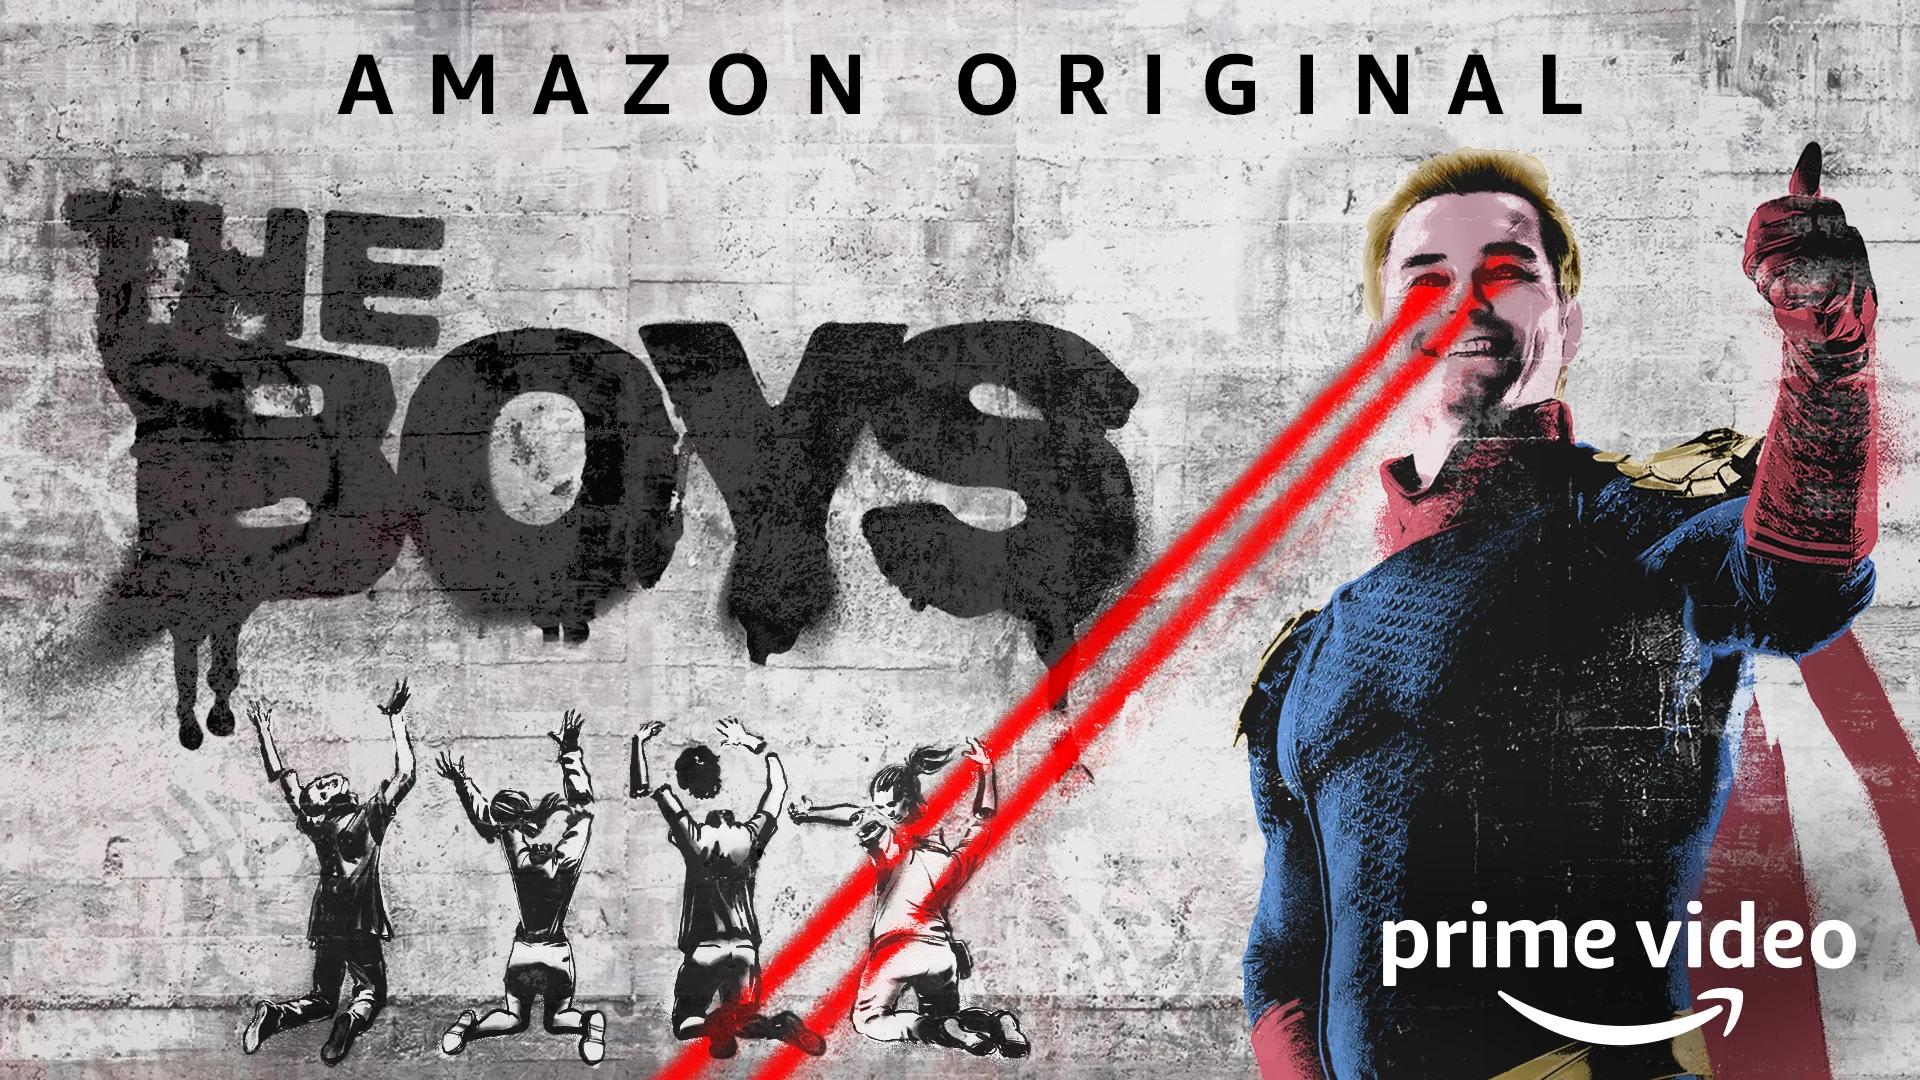 People 1920x1080 The Boys(series) homelander Antony Starr TV Series Amazon prime video poster graffiti